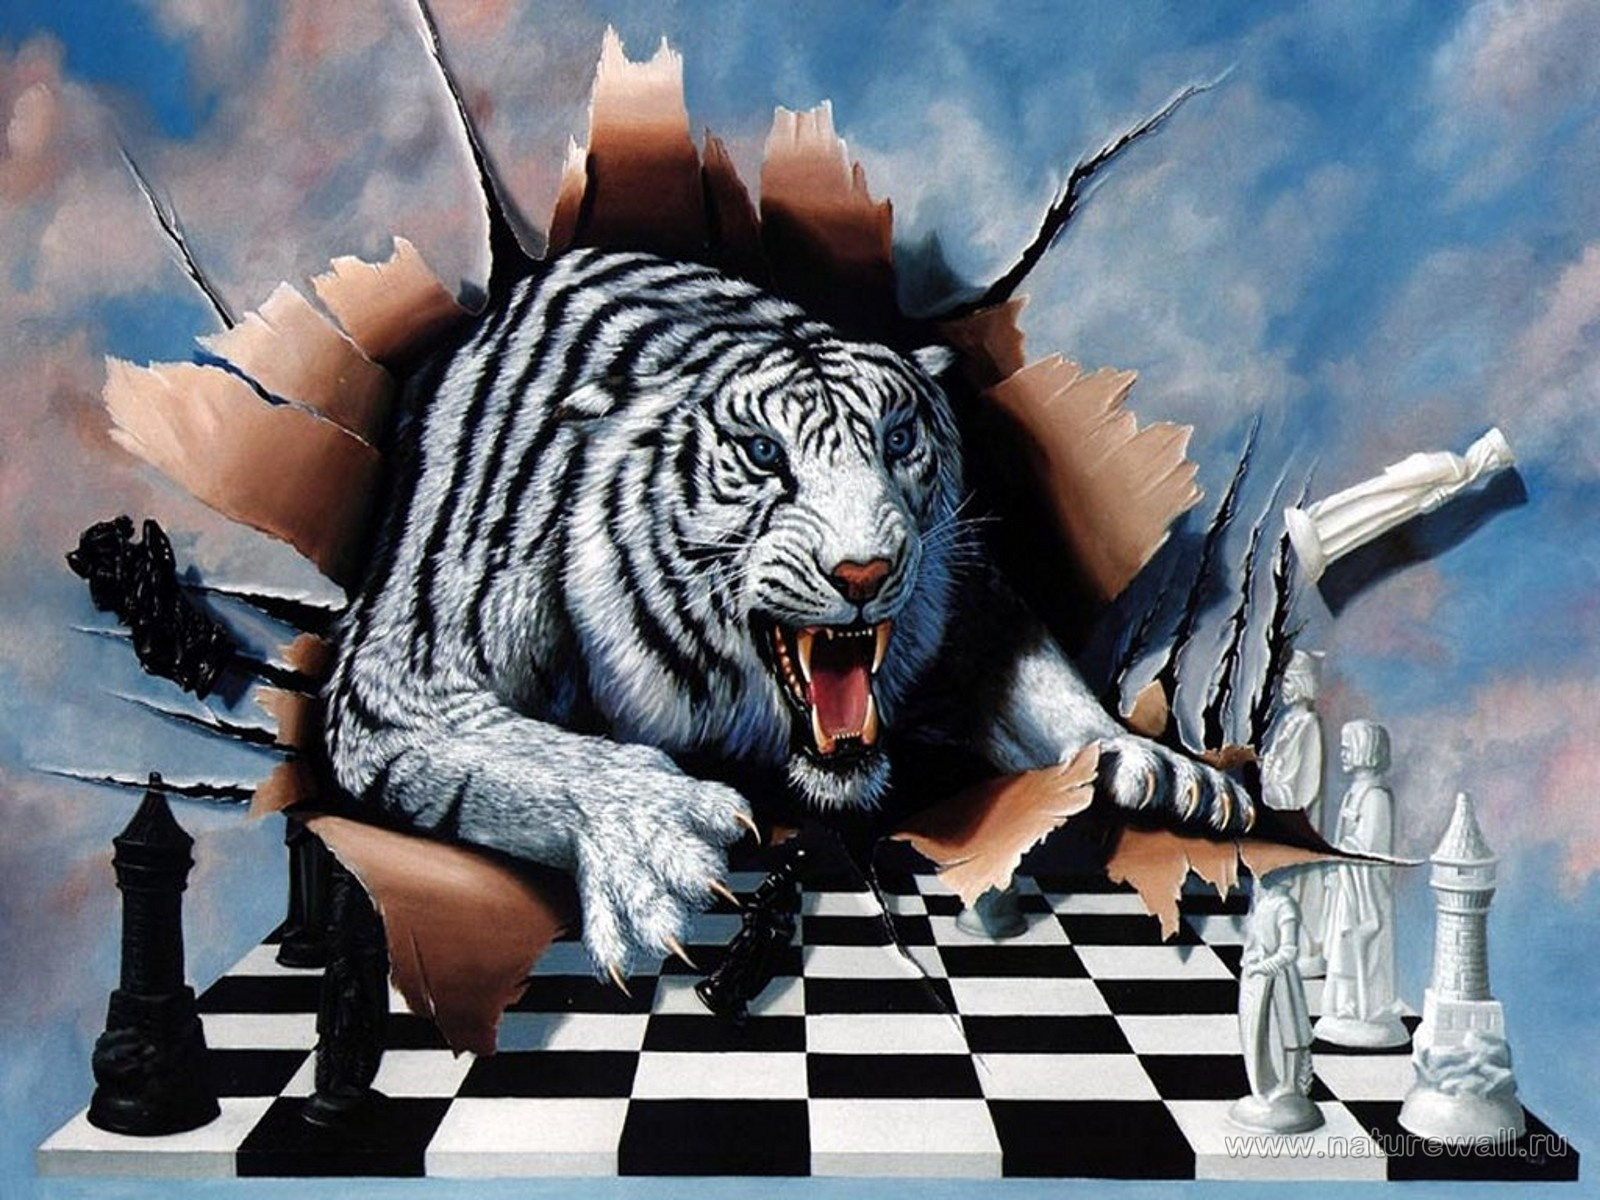 обо на рабочий стол, тигр рвет бумагу, шахматная доска